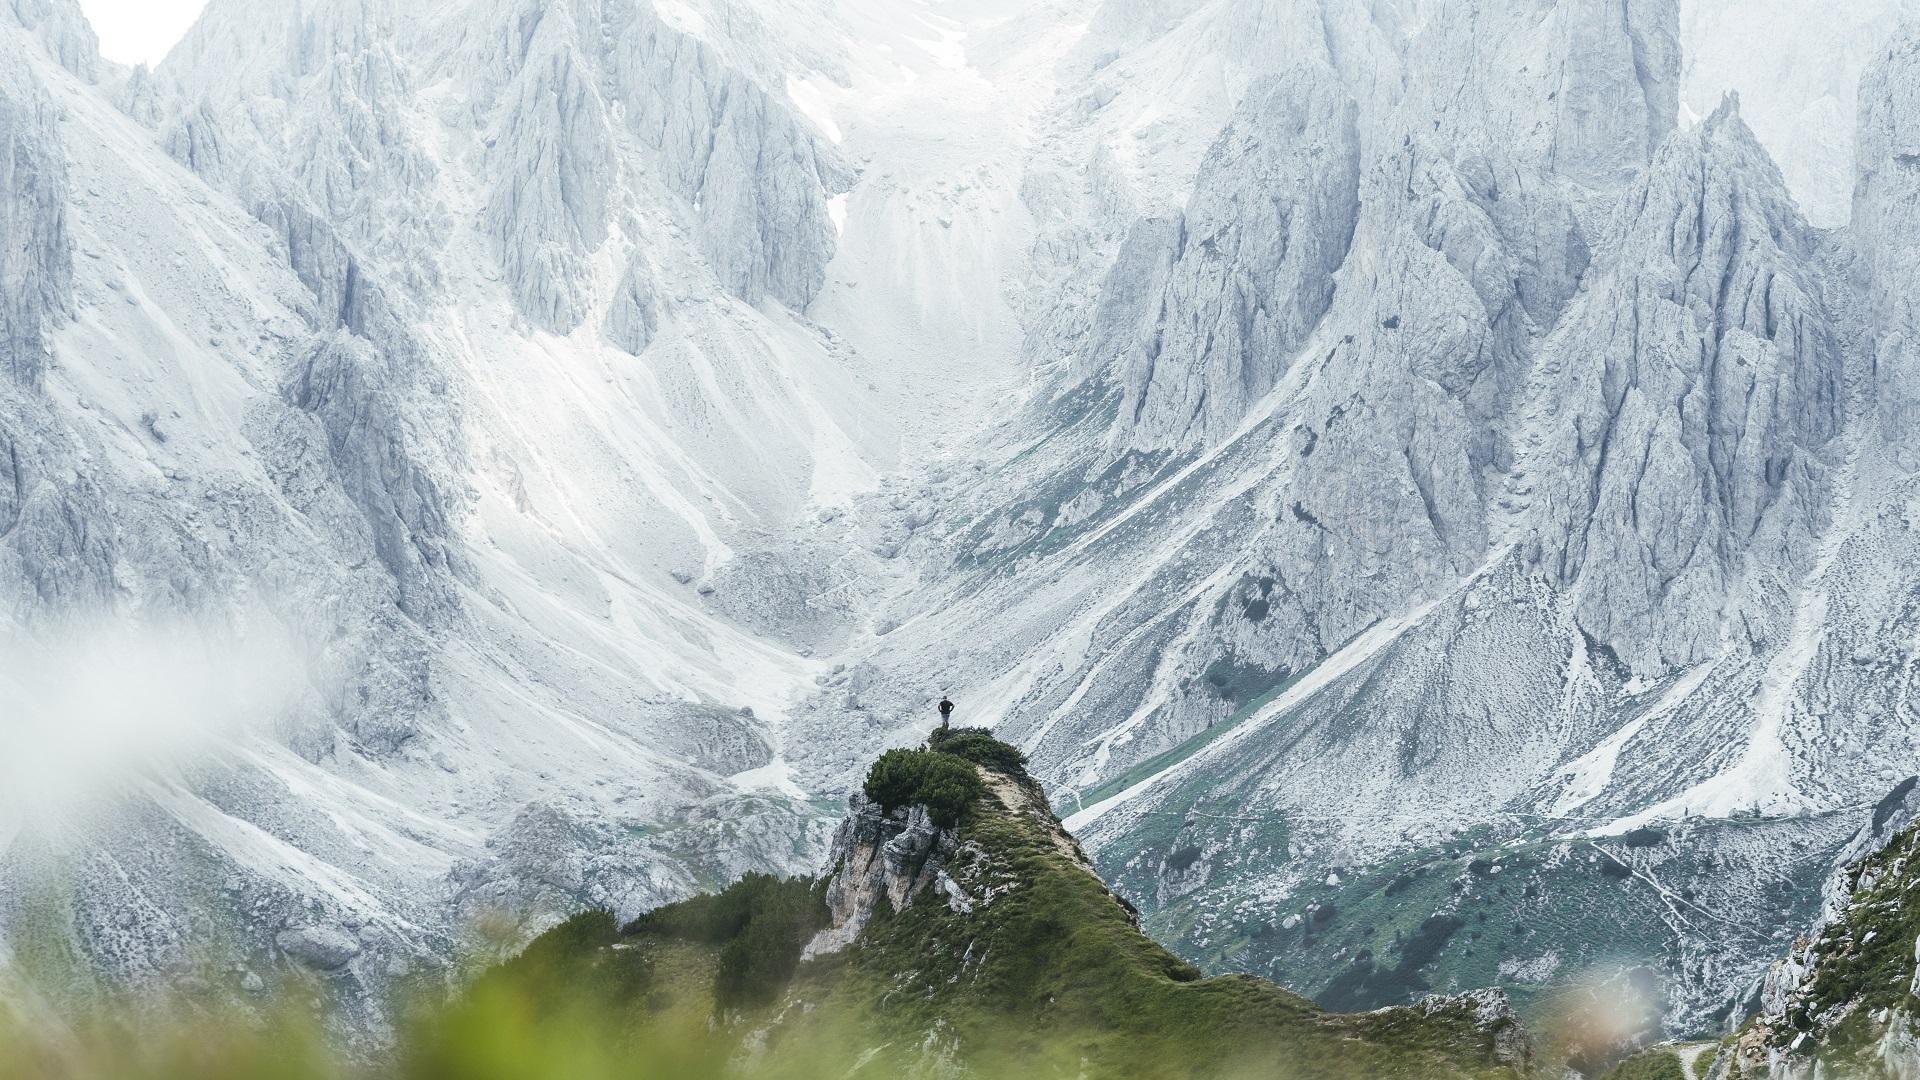 Cold white giants of the italian Dolomites [OC] [1920x1080